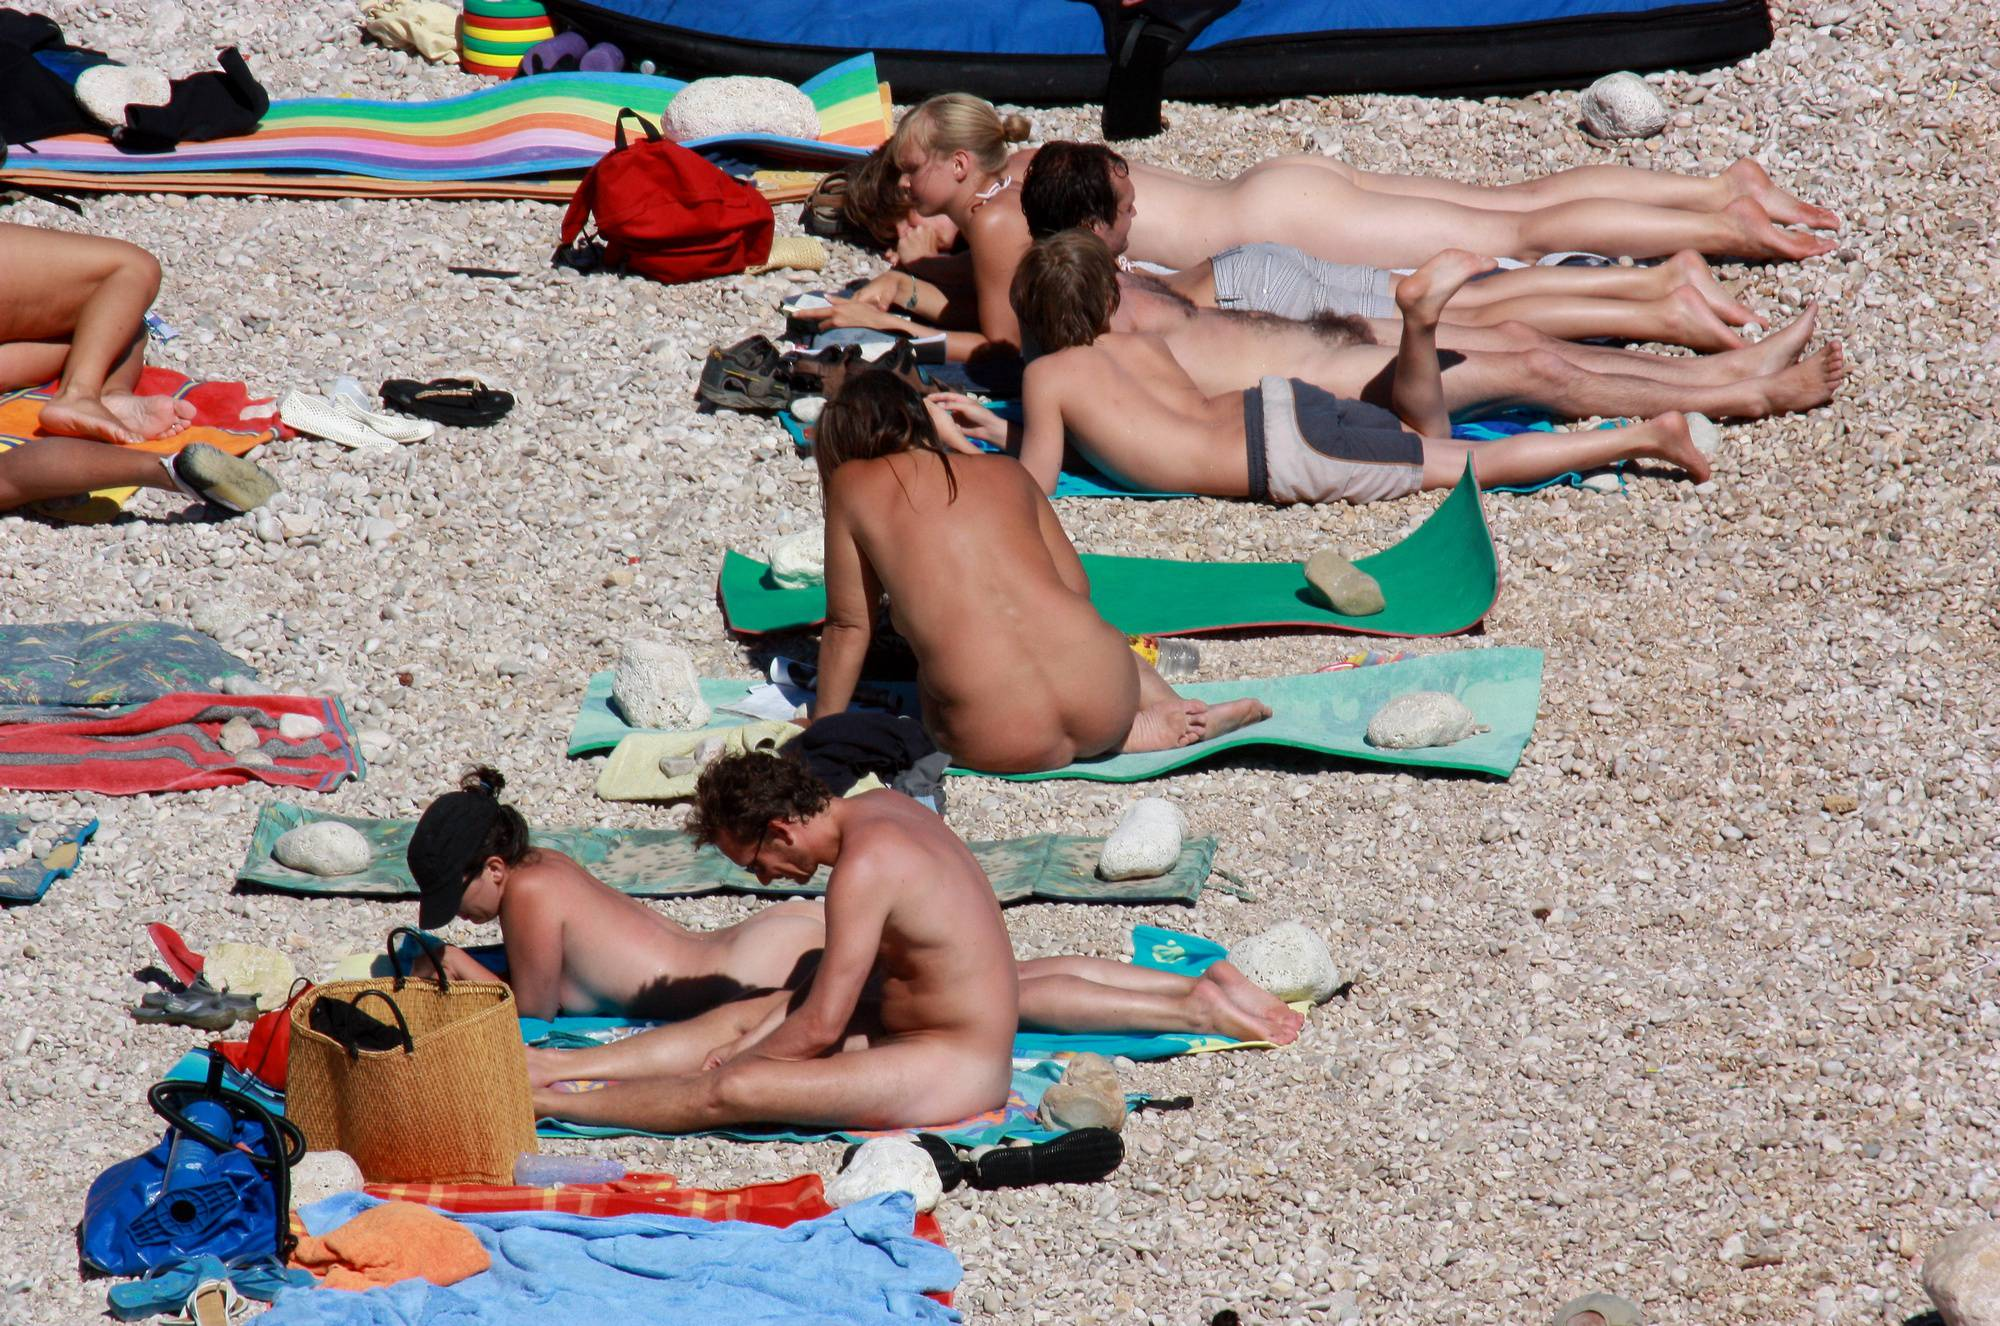 Nudist Family Beach Look - 2